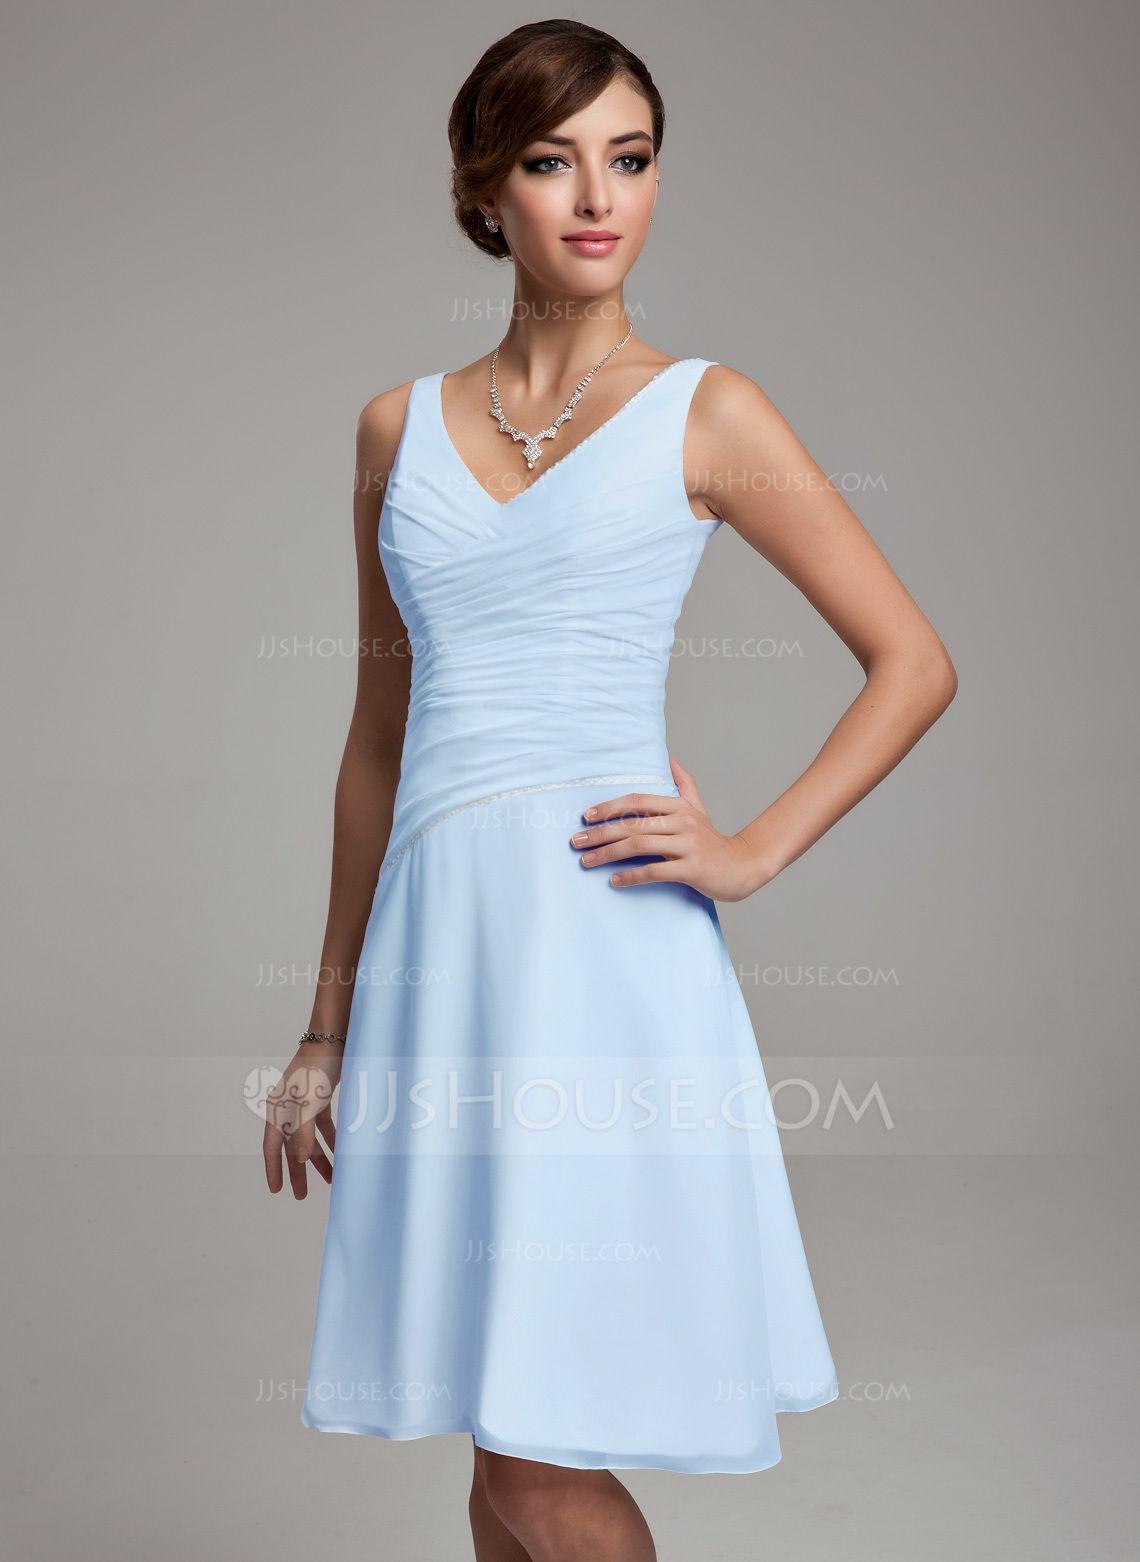 Alineprincess vneck kneelength chiffon bridesmaid dress with